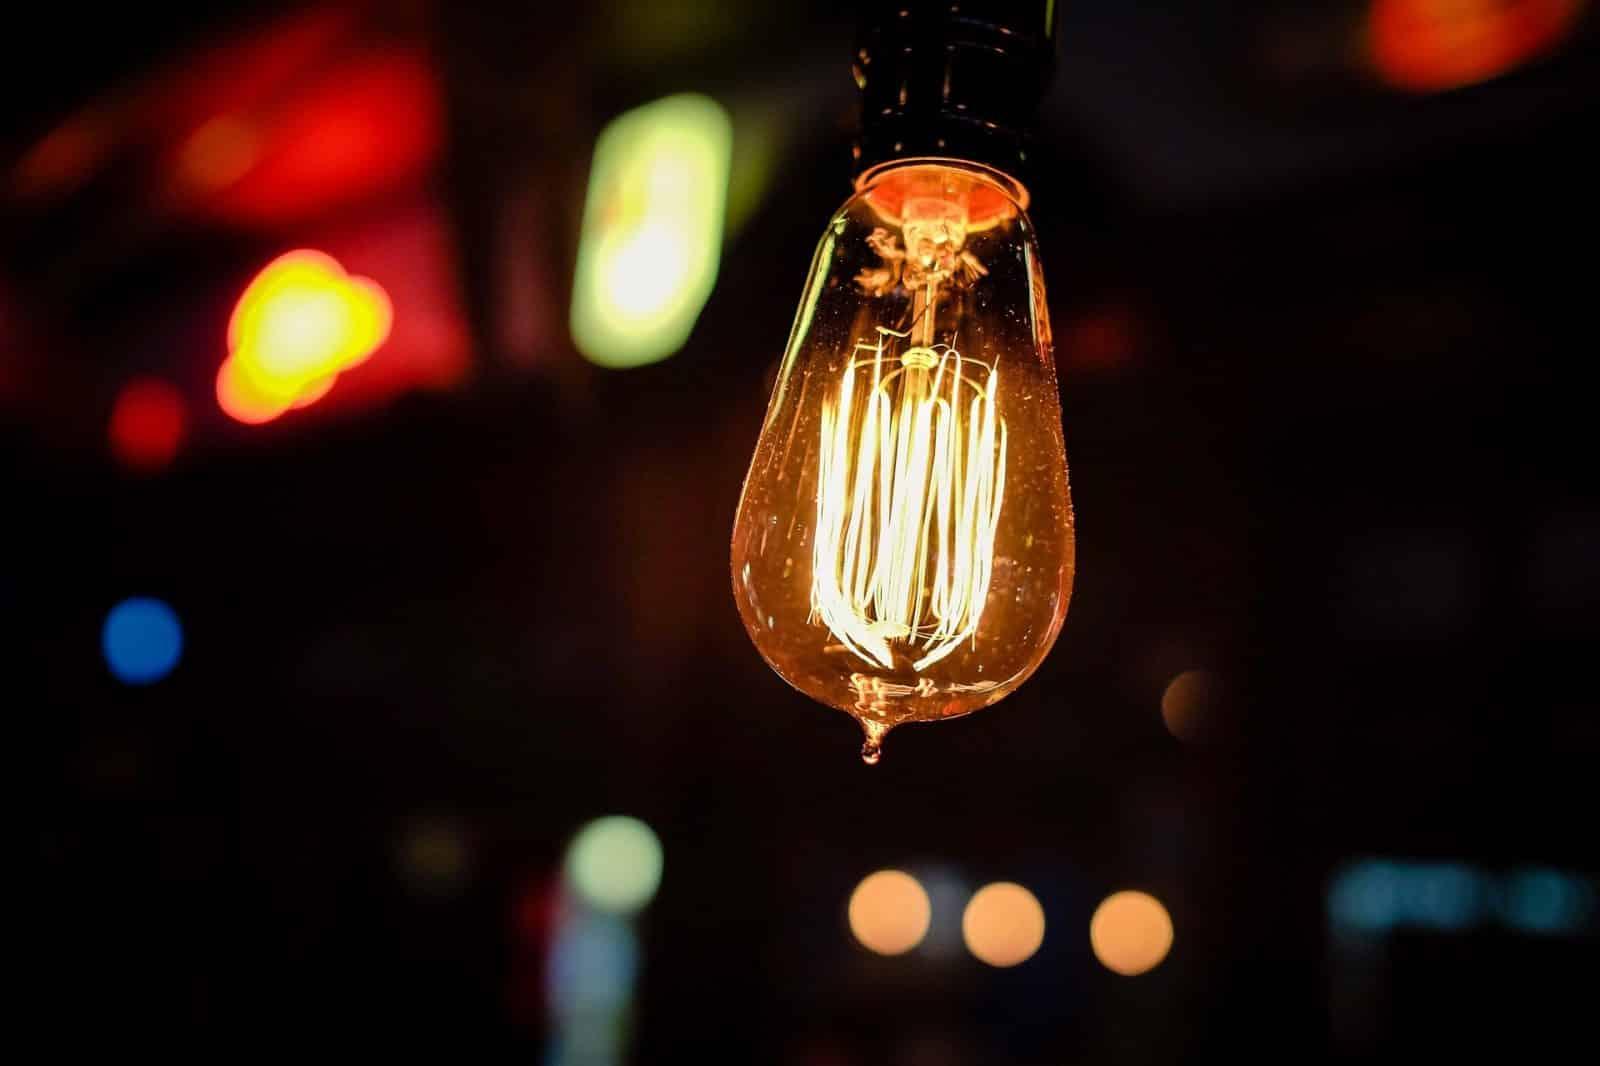 L'innovation des grands groupes passe par les start-ups